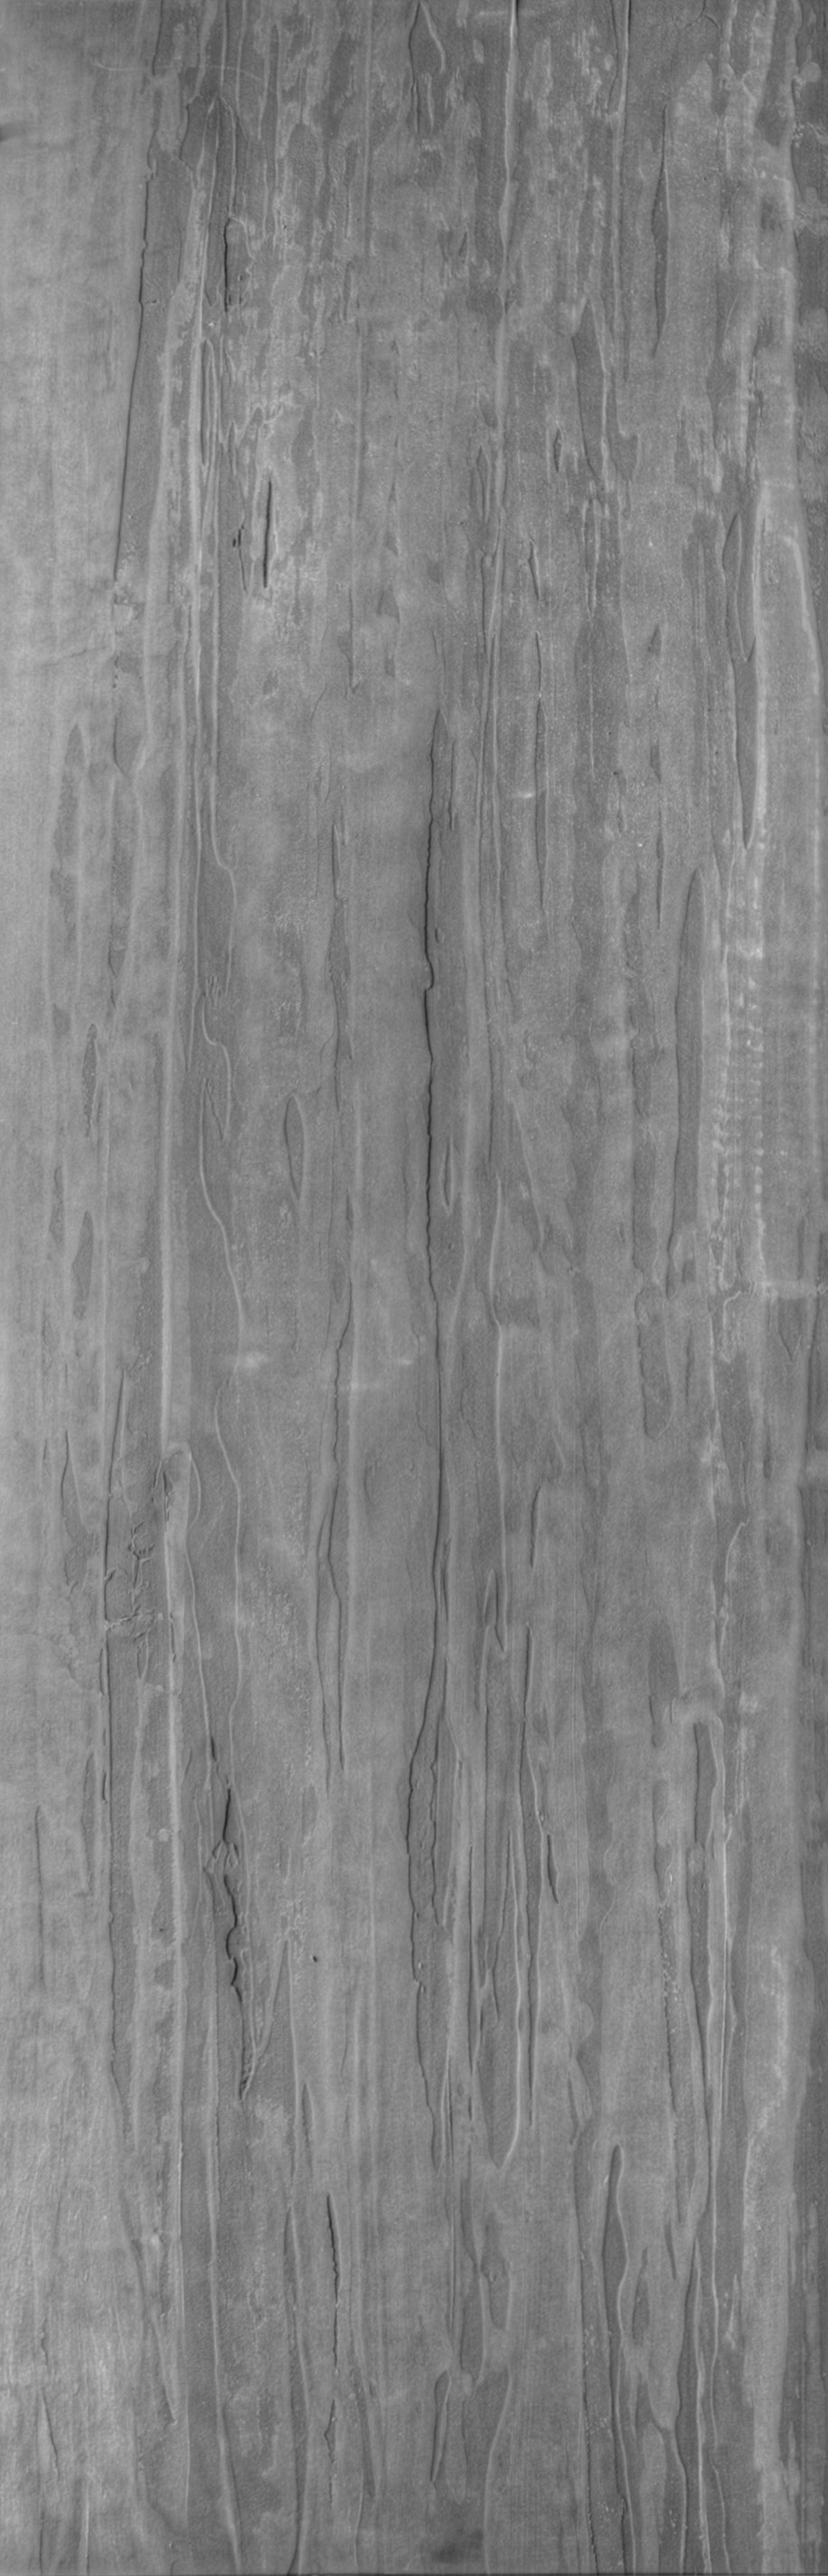 Decorative Concrete Wall Panel Concrete Finishes Range From Stonini Wall Panels Wall Walldecor W Concrete Wall Panels Exterior Stairs Concrete Interiors